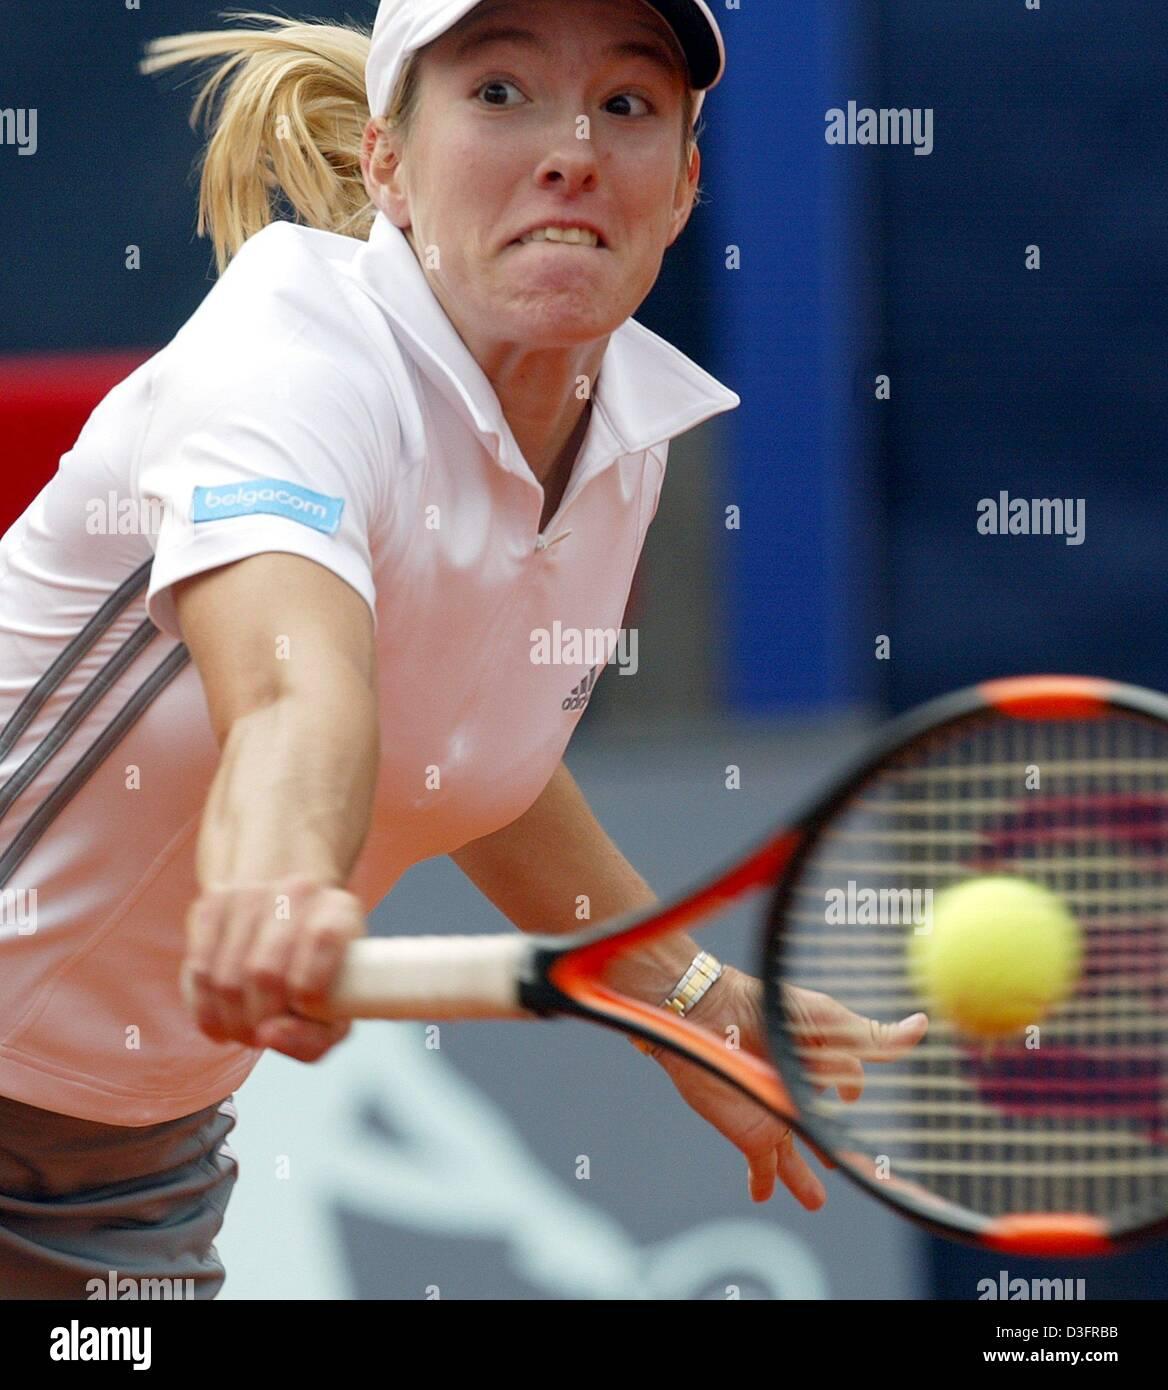 dpa Belgian tennis player Justine Henin Hardenne plays a